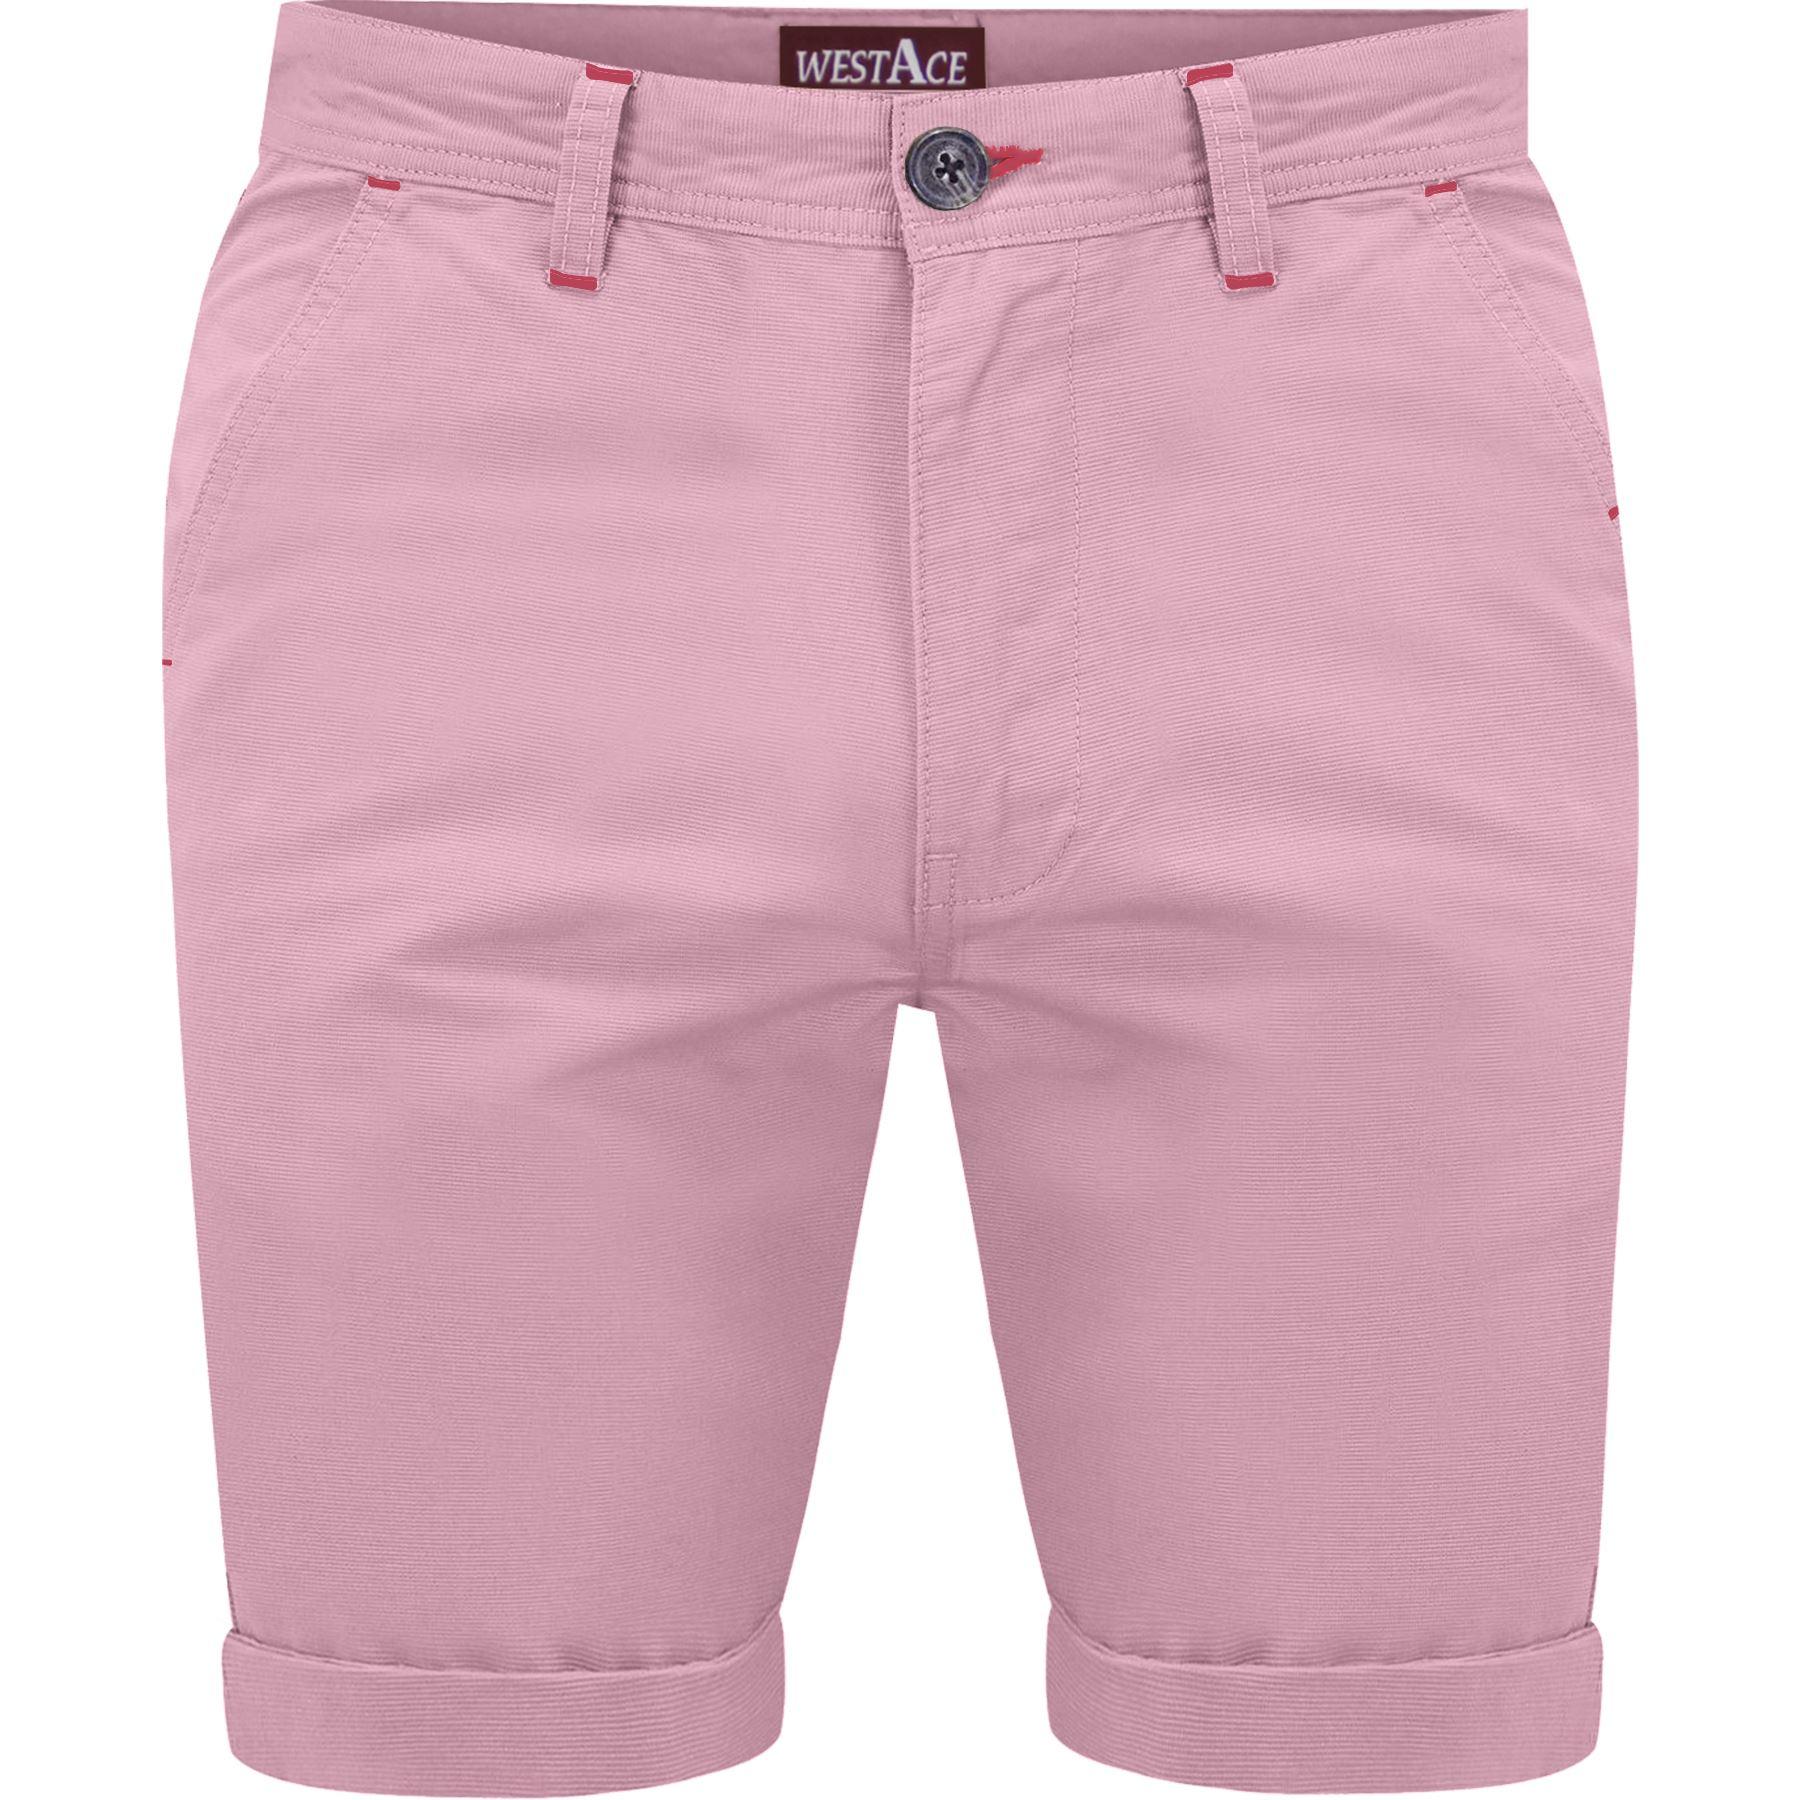 Mens-Chino-Shorts-Cotton-Summer-Casual-Jeans-Cargo-Combat-Half-Pants-Casual-New thumbnail 7